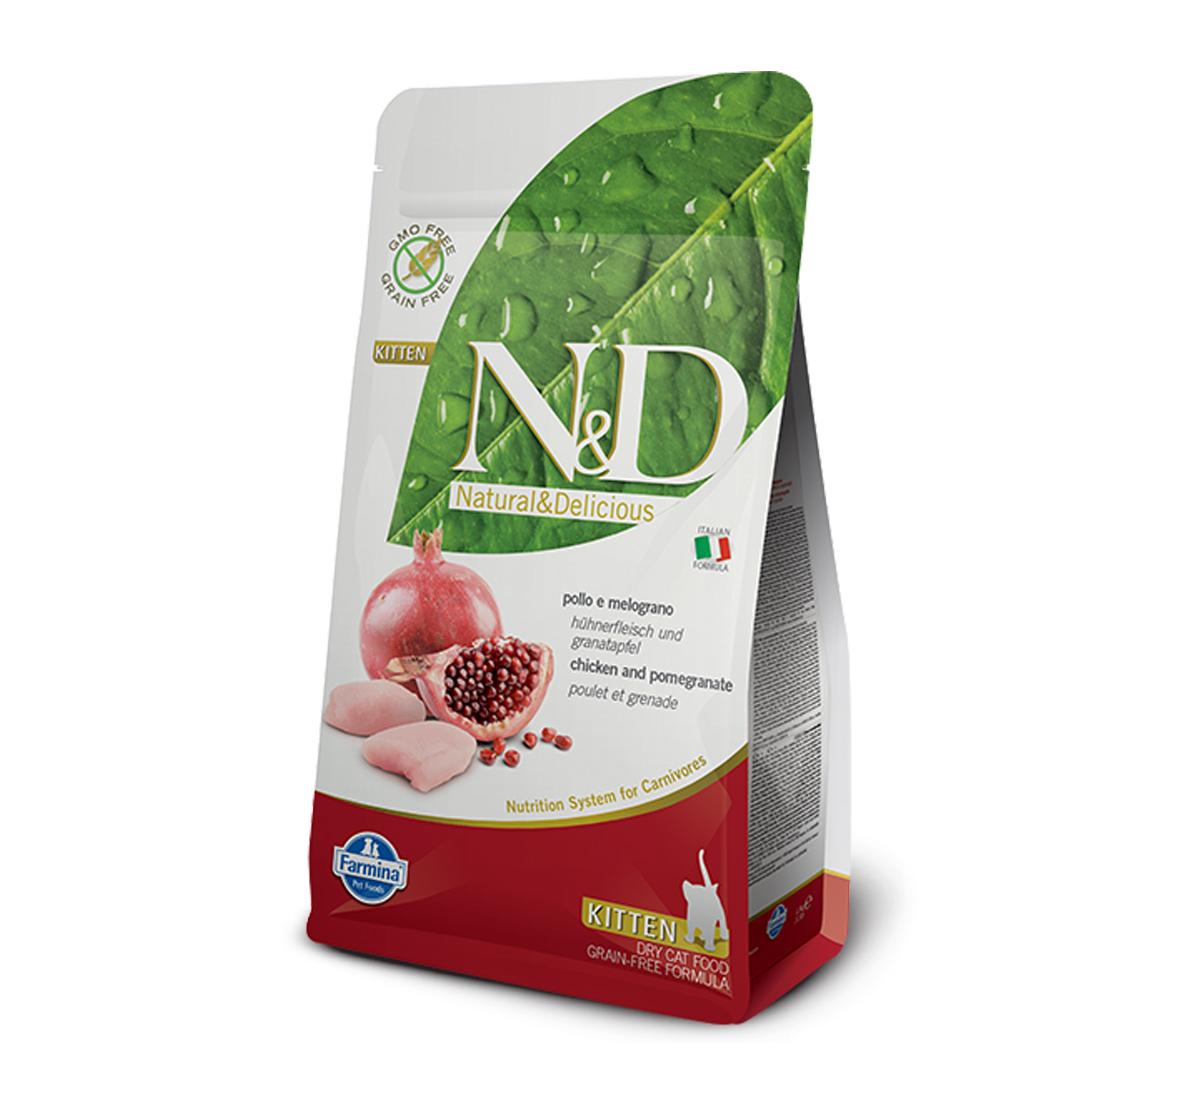 Farmina N&D Dry Cat Food Grain Free Chicken & Pomegranate Kitten - 1.5 Kg (Pack Of 8)